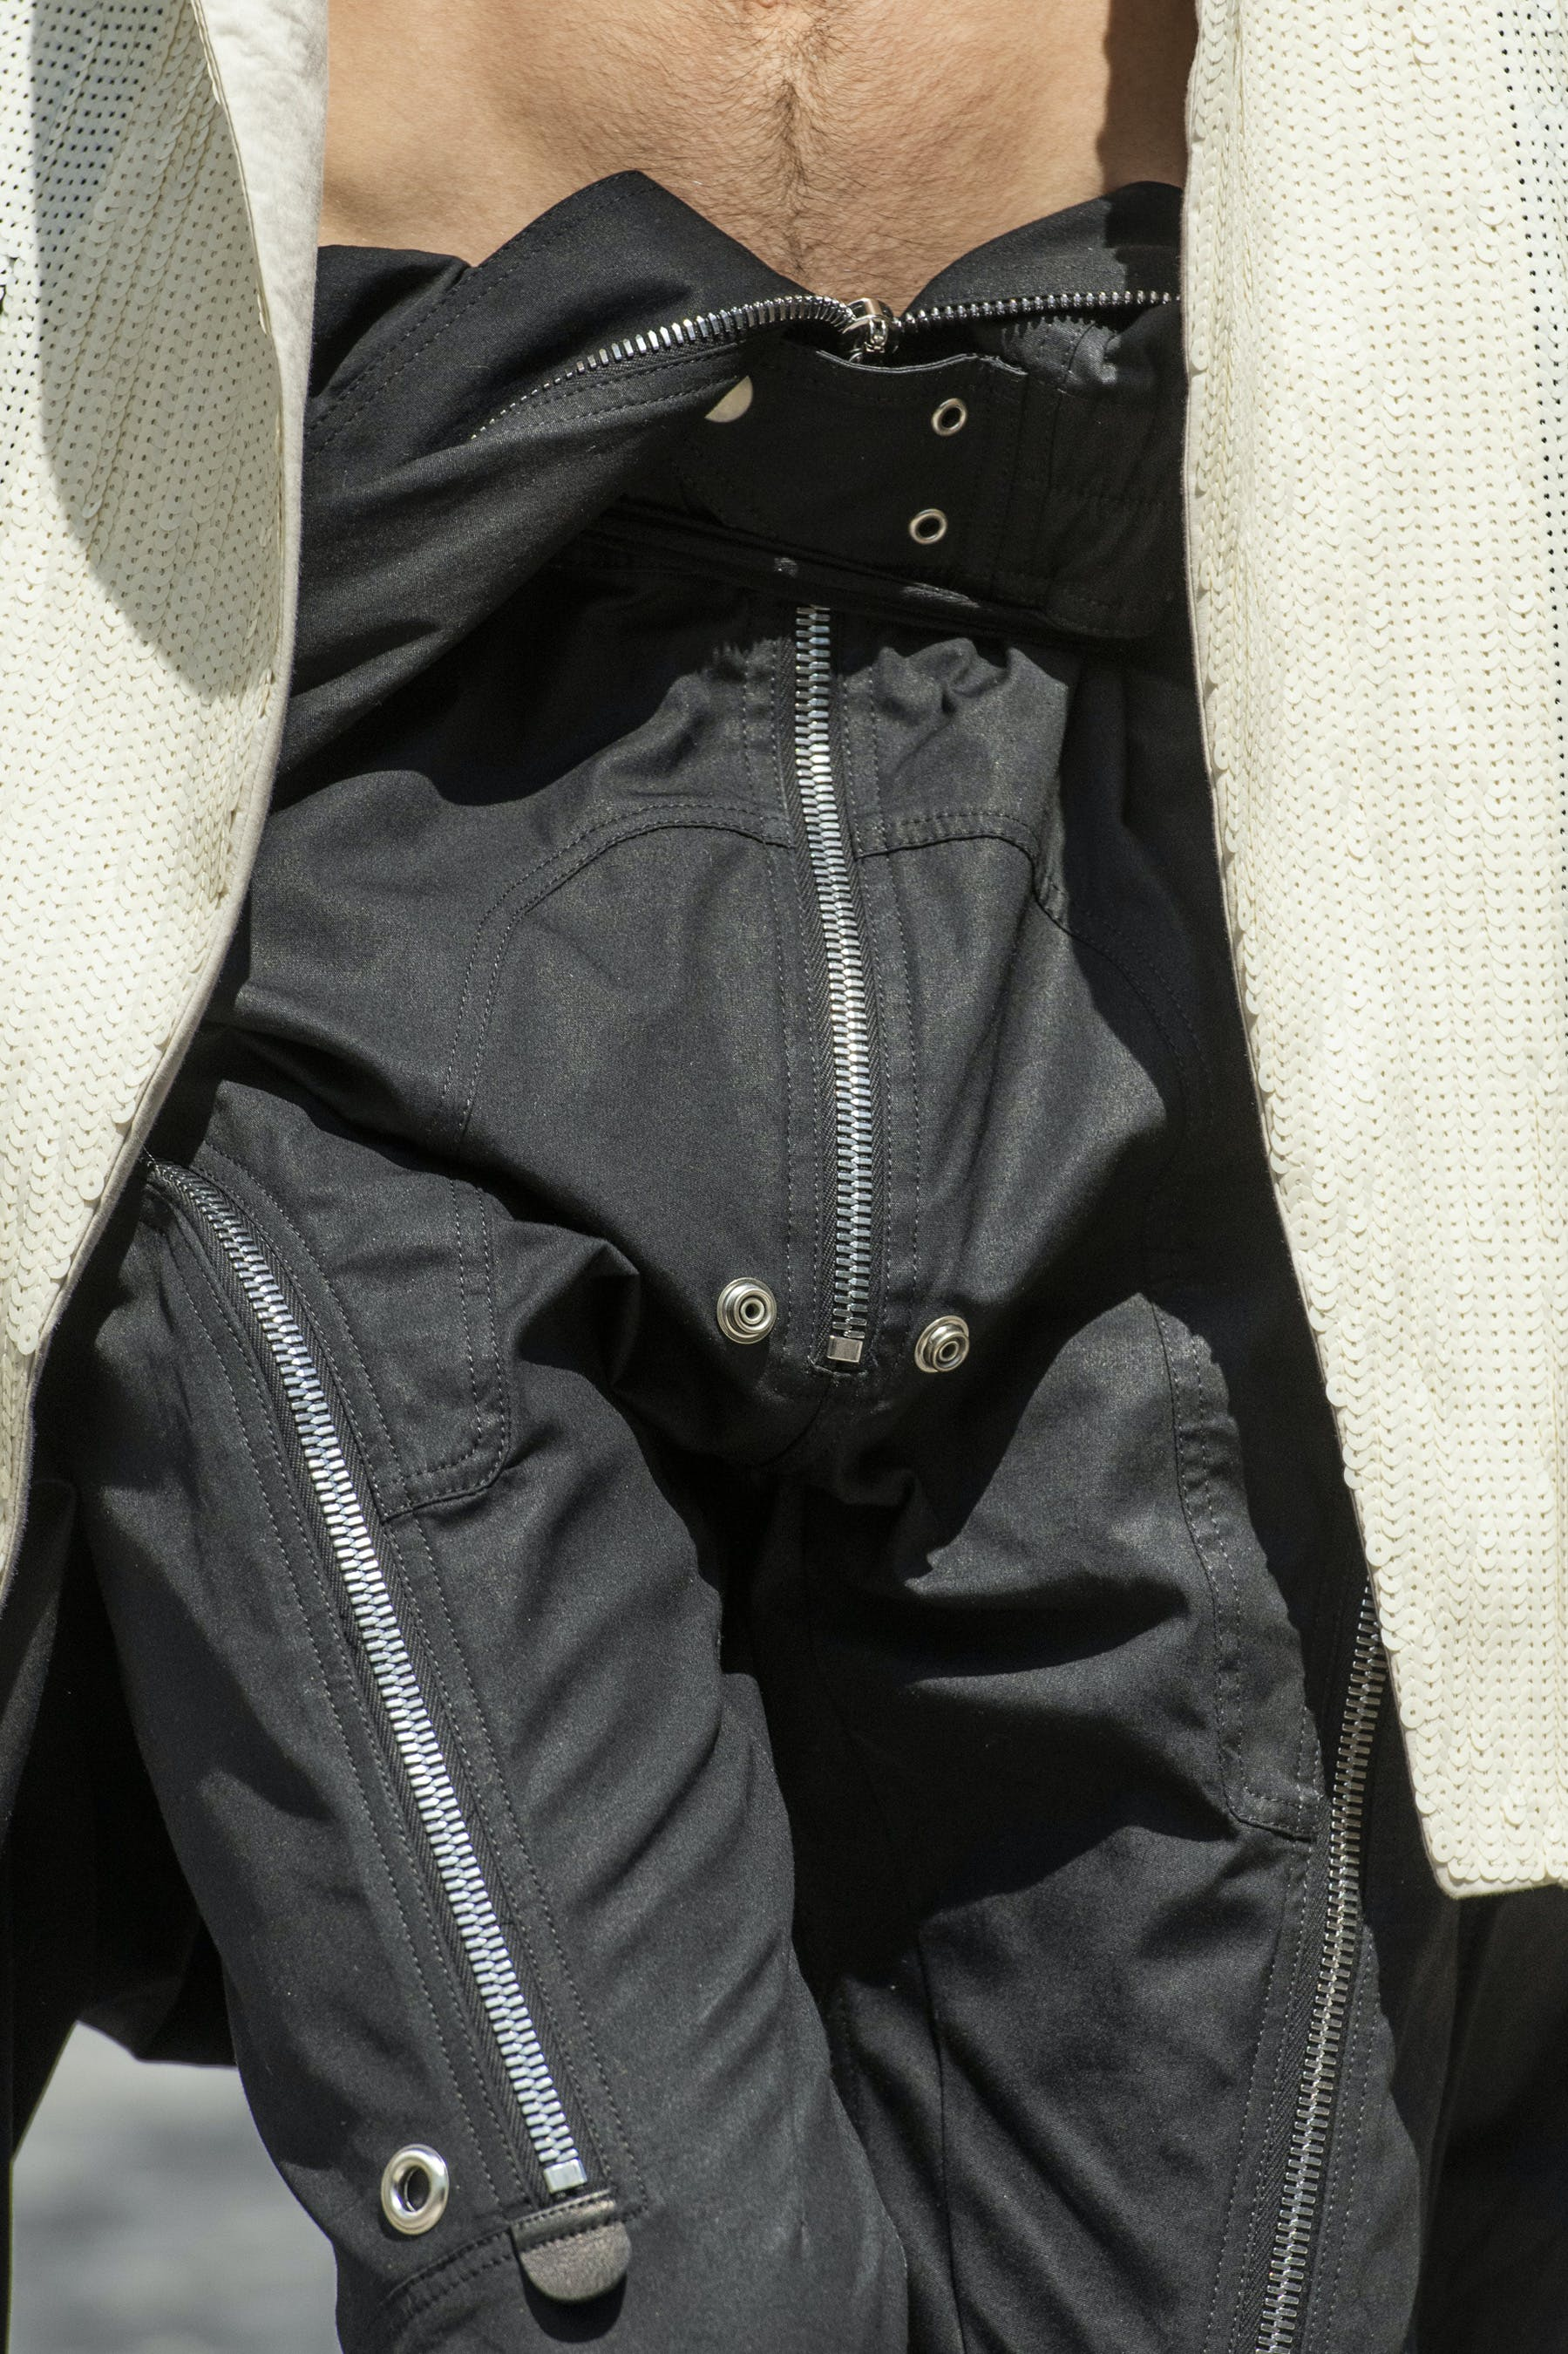 Rick Owens Runway Details Ies bodybag In Black Cotton Close Up Mens SS20 Tecautl